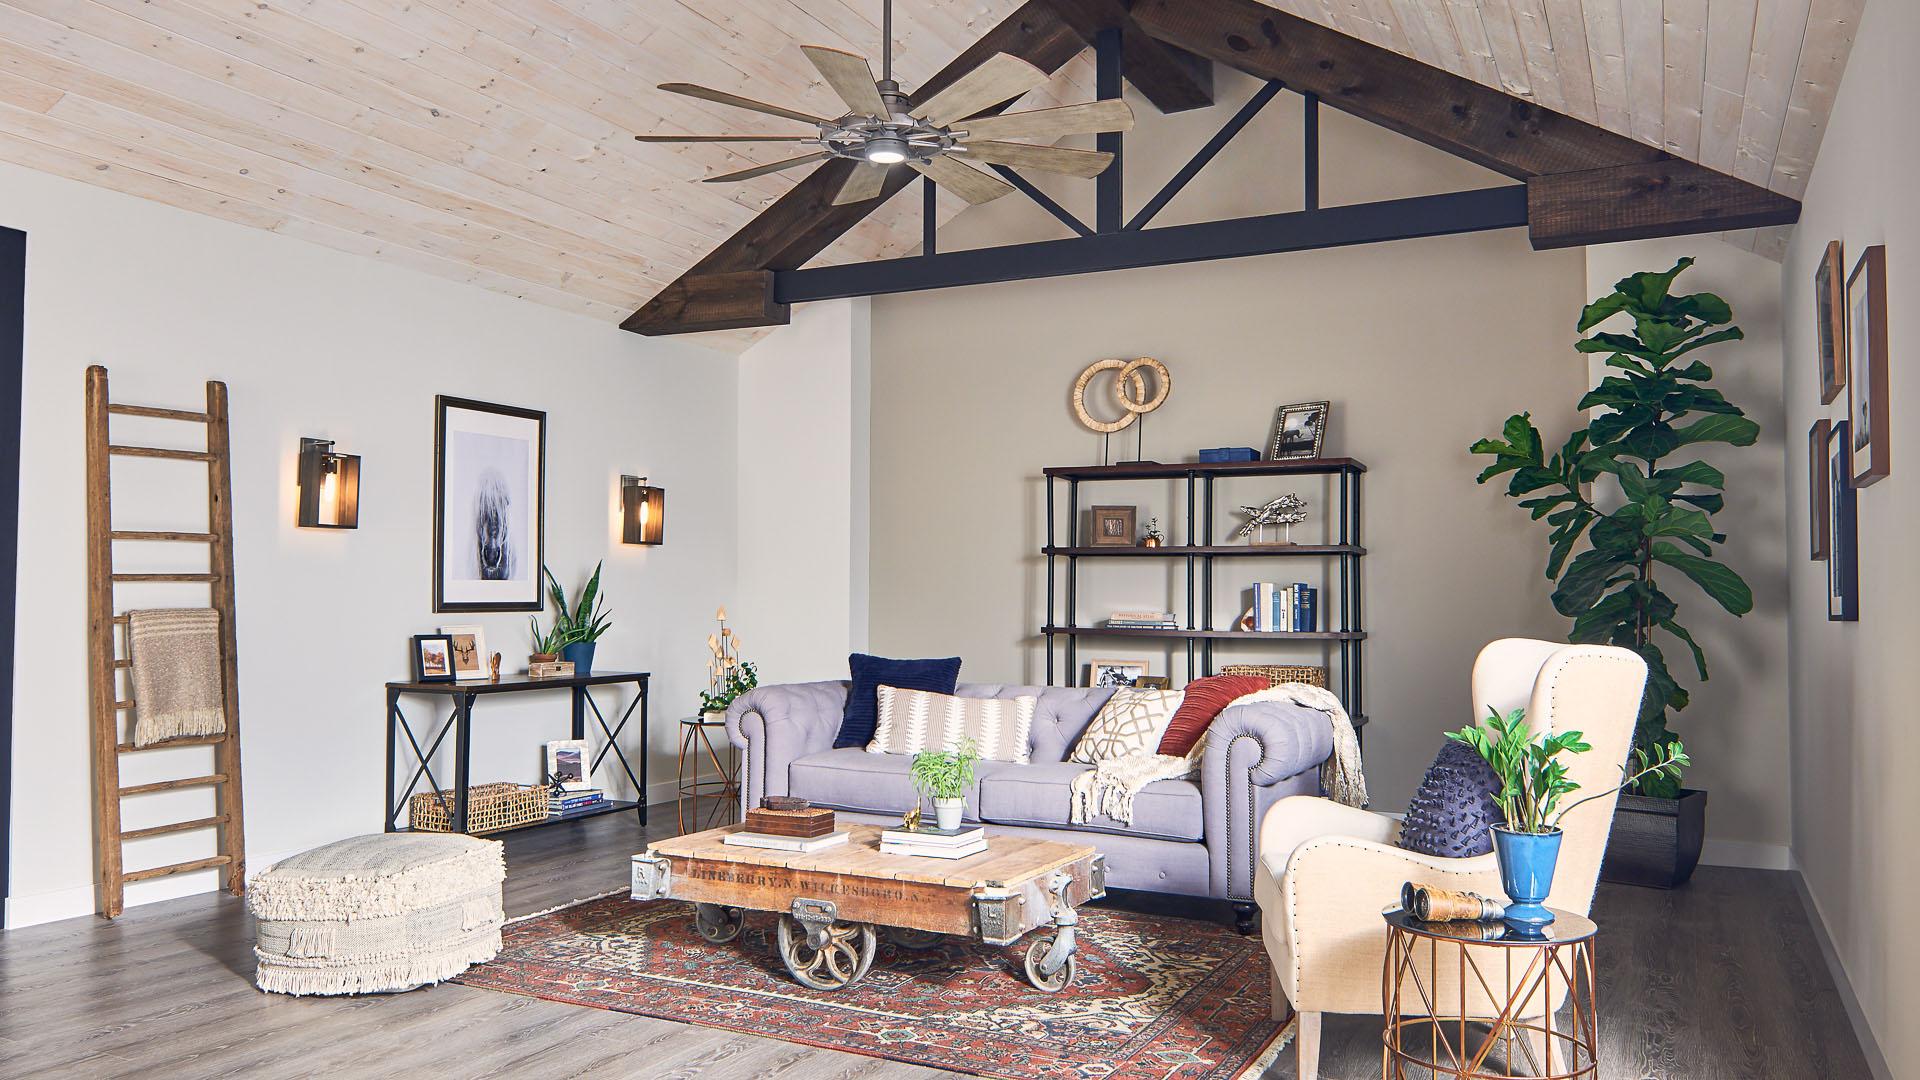 Ceiling fan kichler lighting - Size of ceiling fan for living room ...